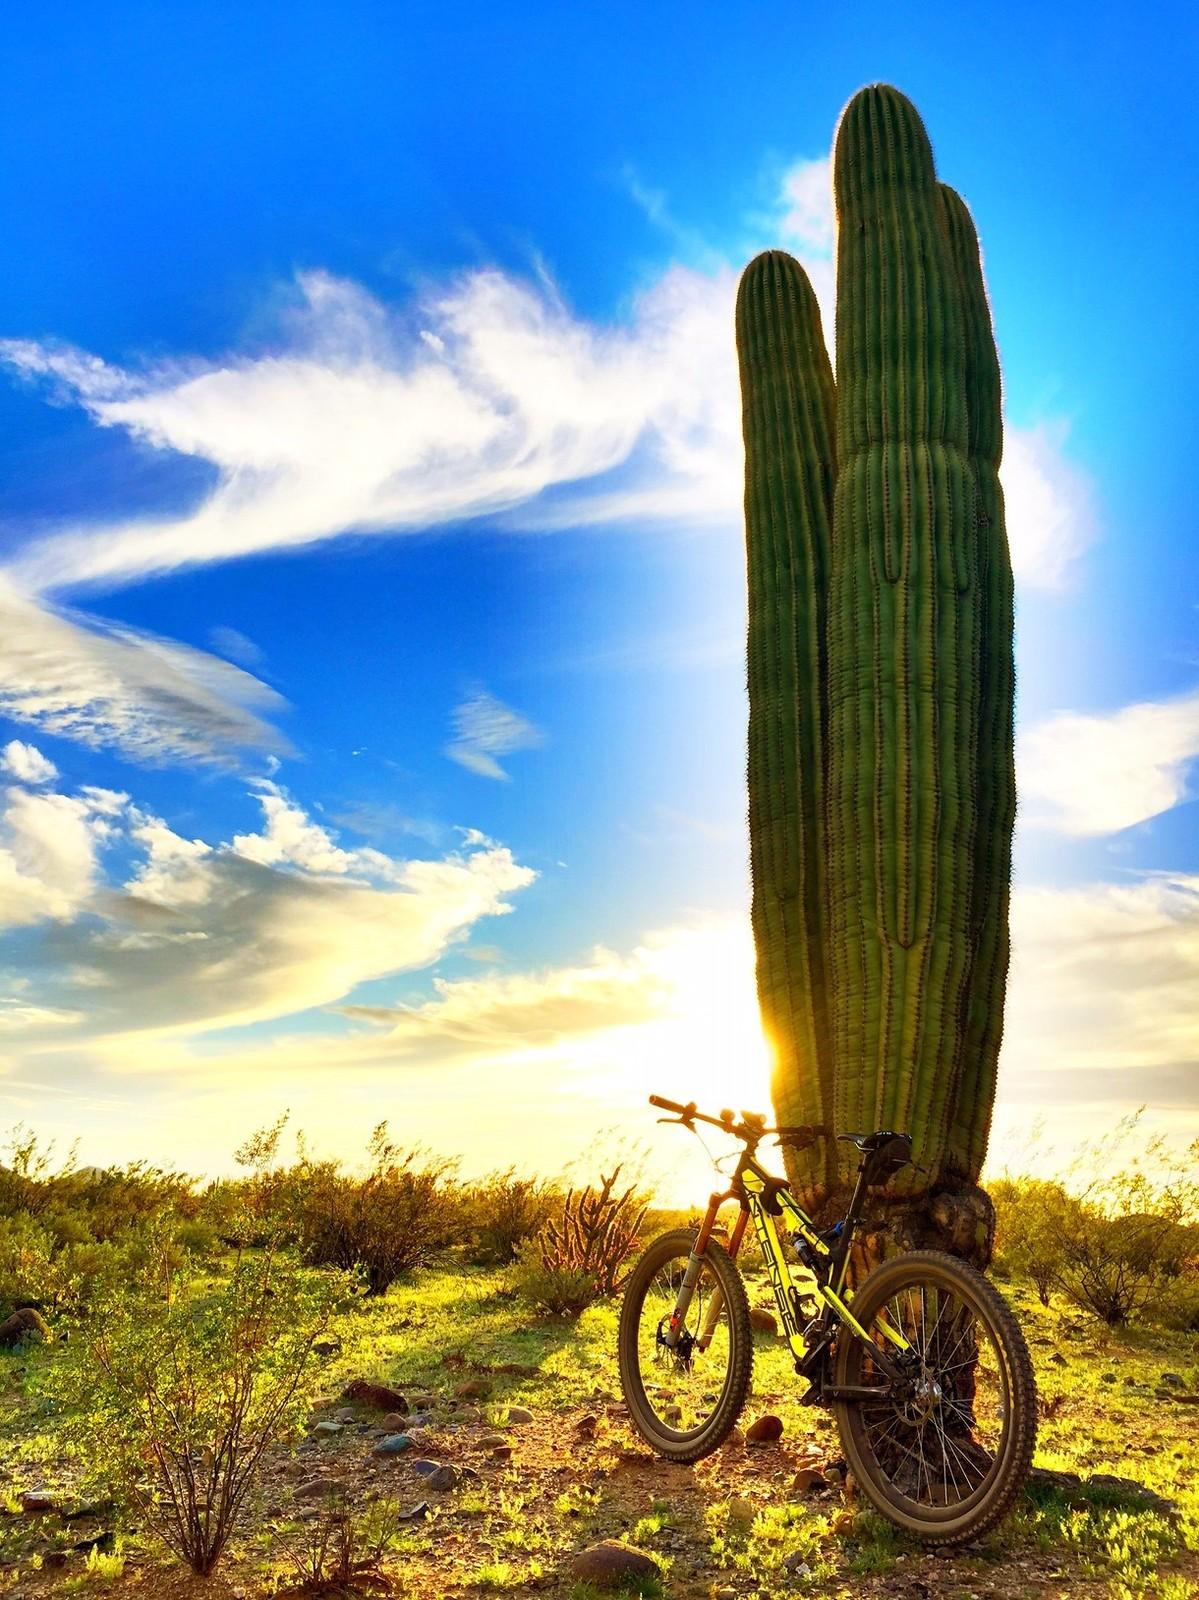 Carbine in the desert - azmtbr - Mountain Biking Pictures - Vital MTB